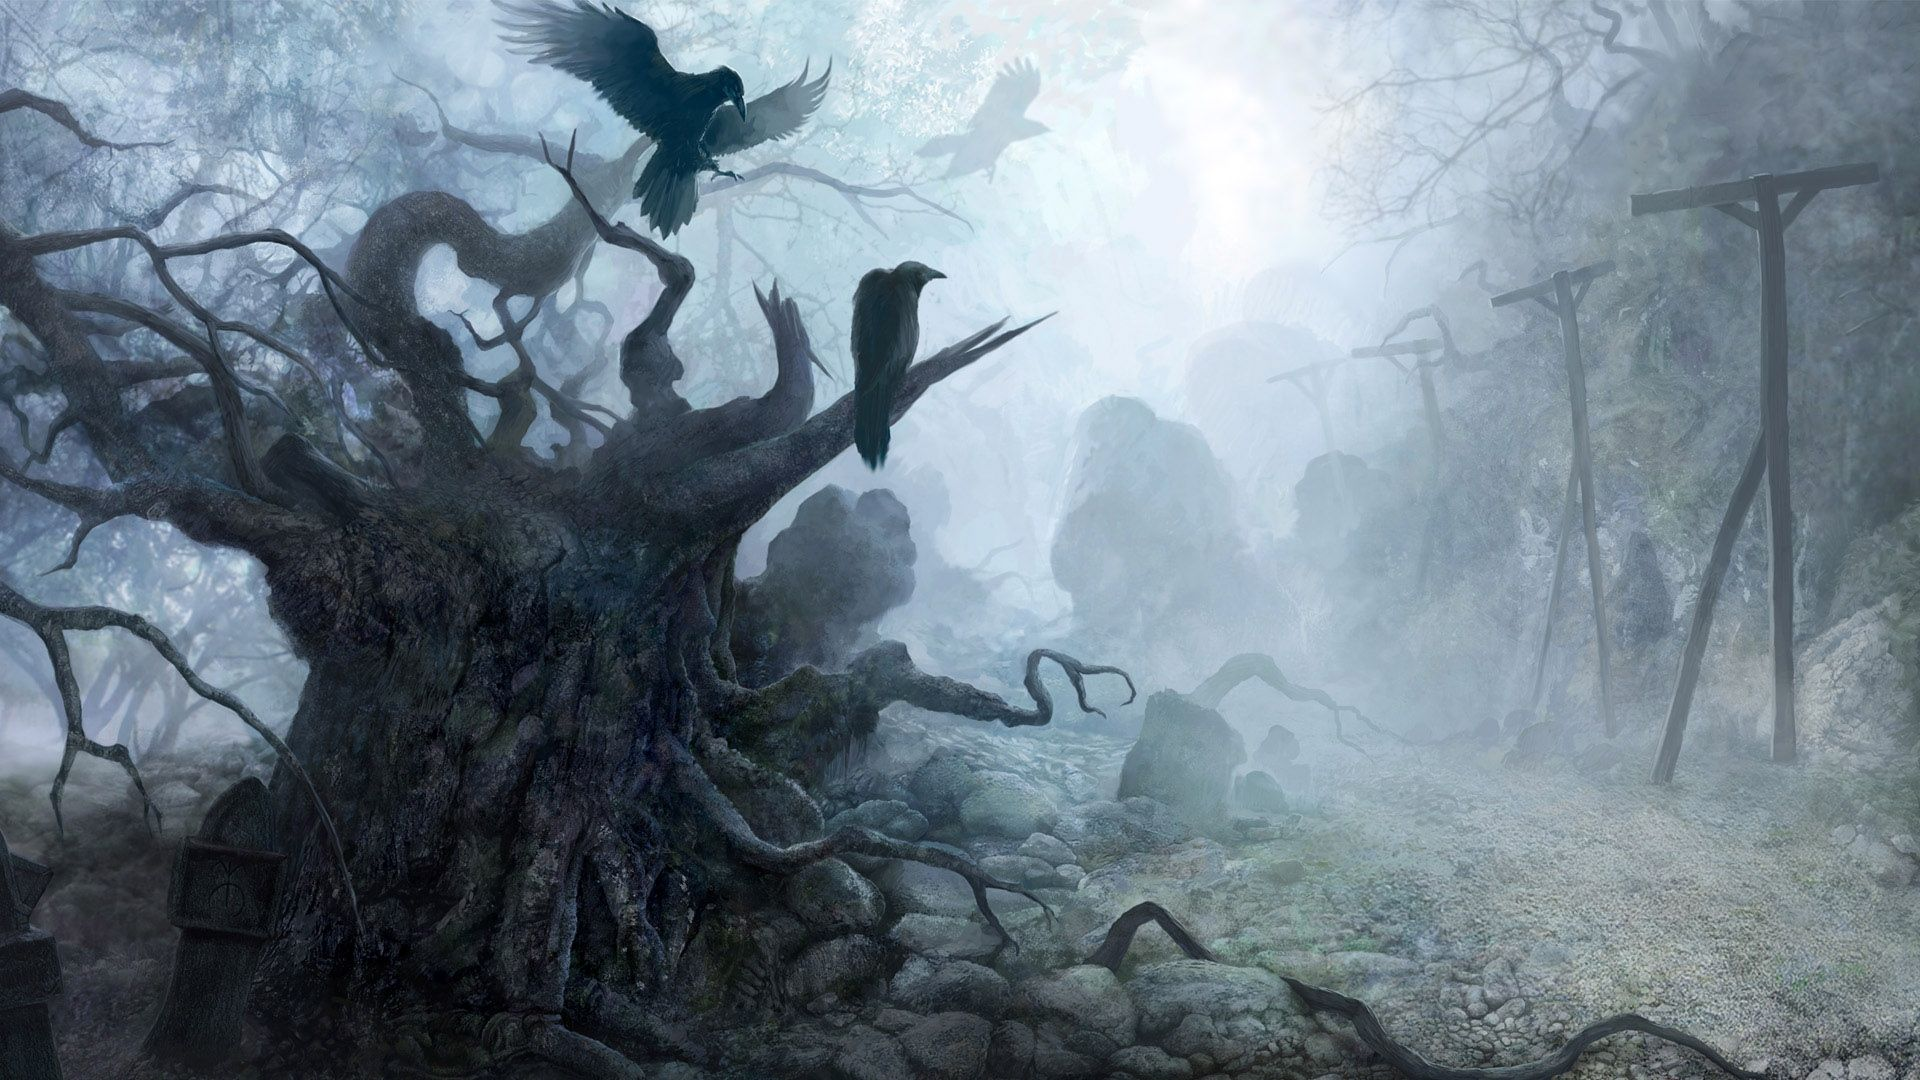 Gothic Dark Art 3D Fantasy Places HD picture nr 47798 1920x1080